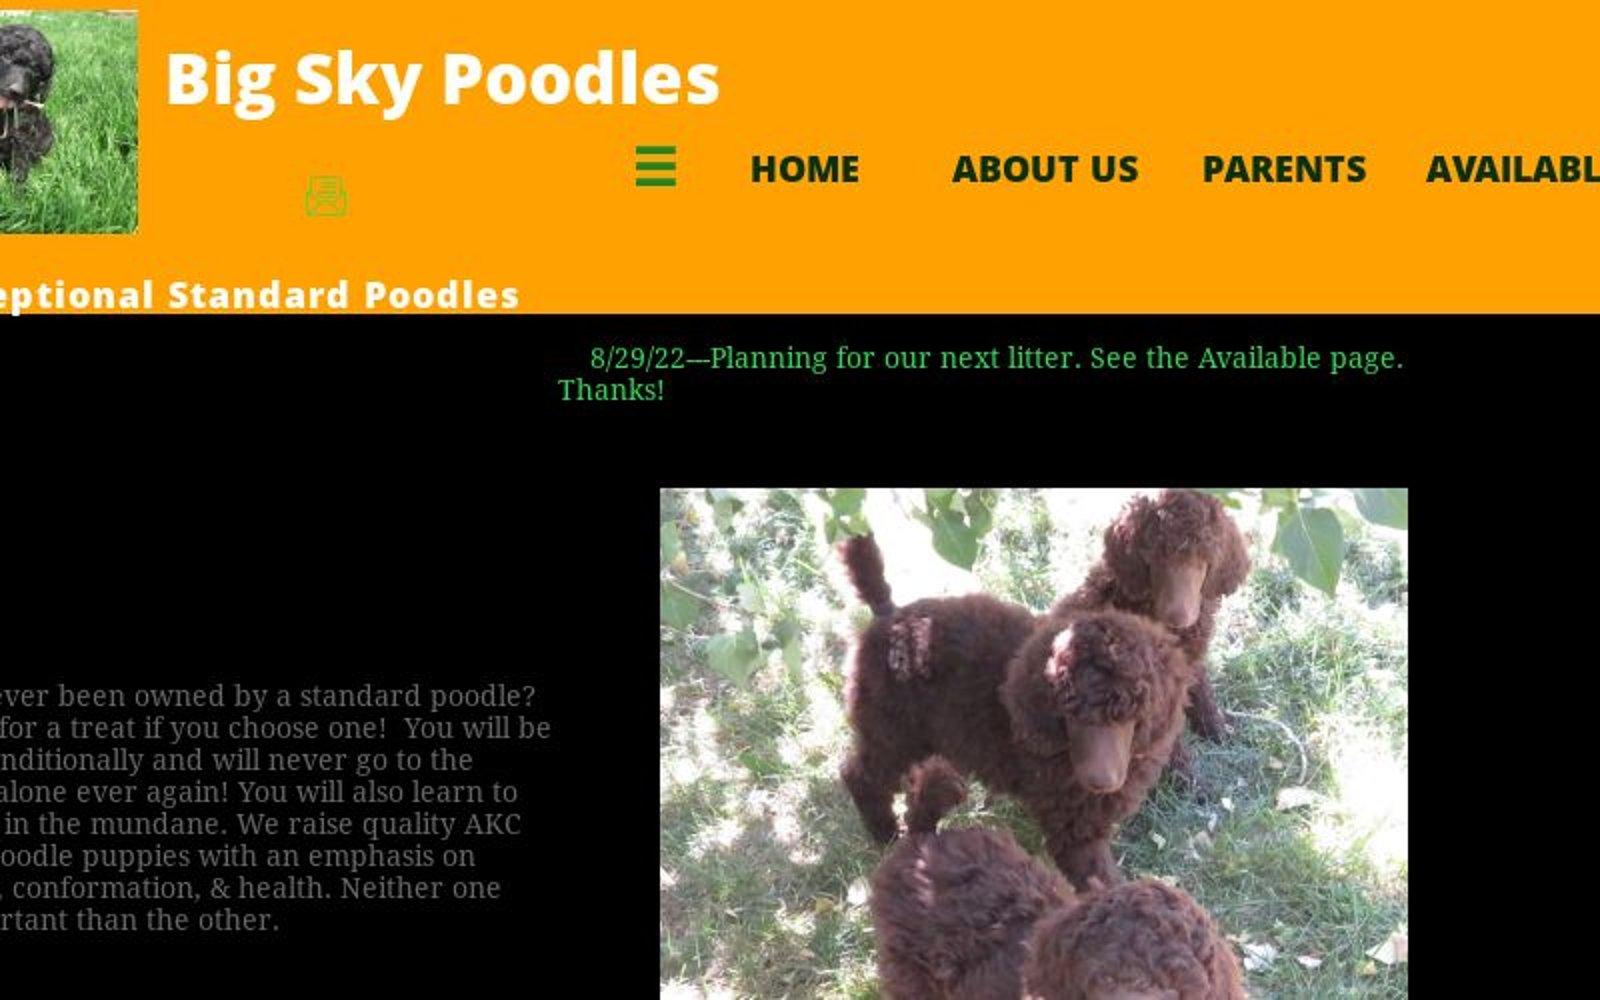 www.bigskypoodles.com